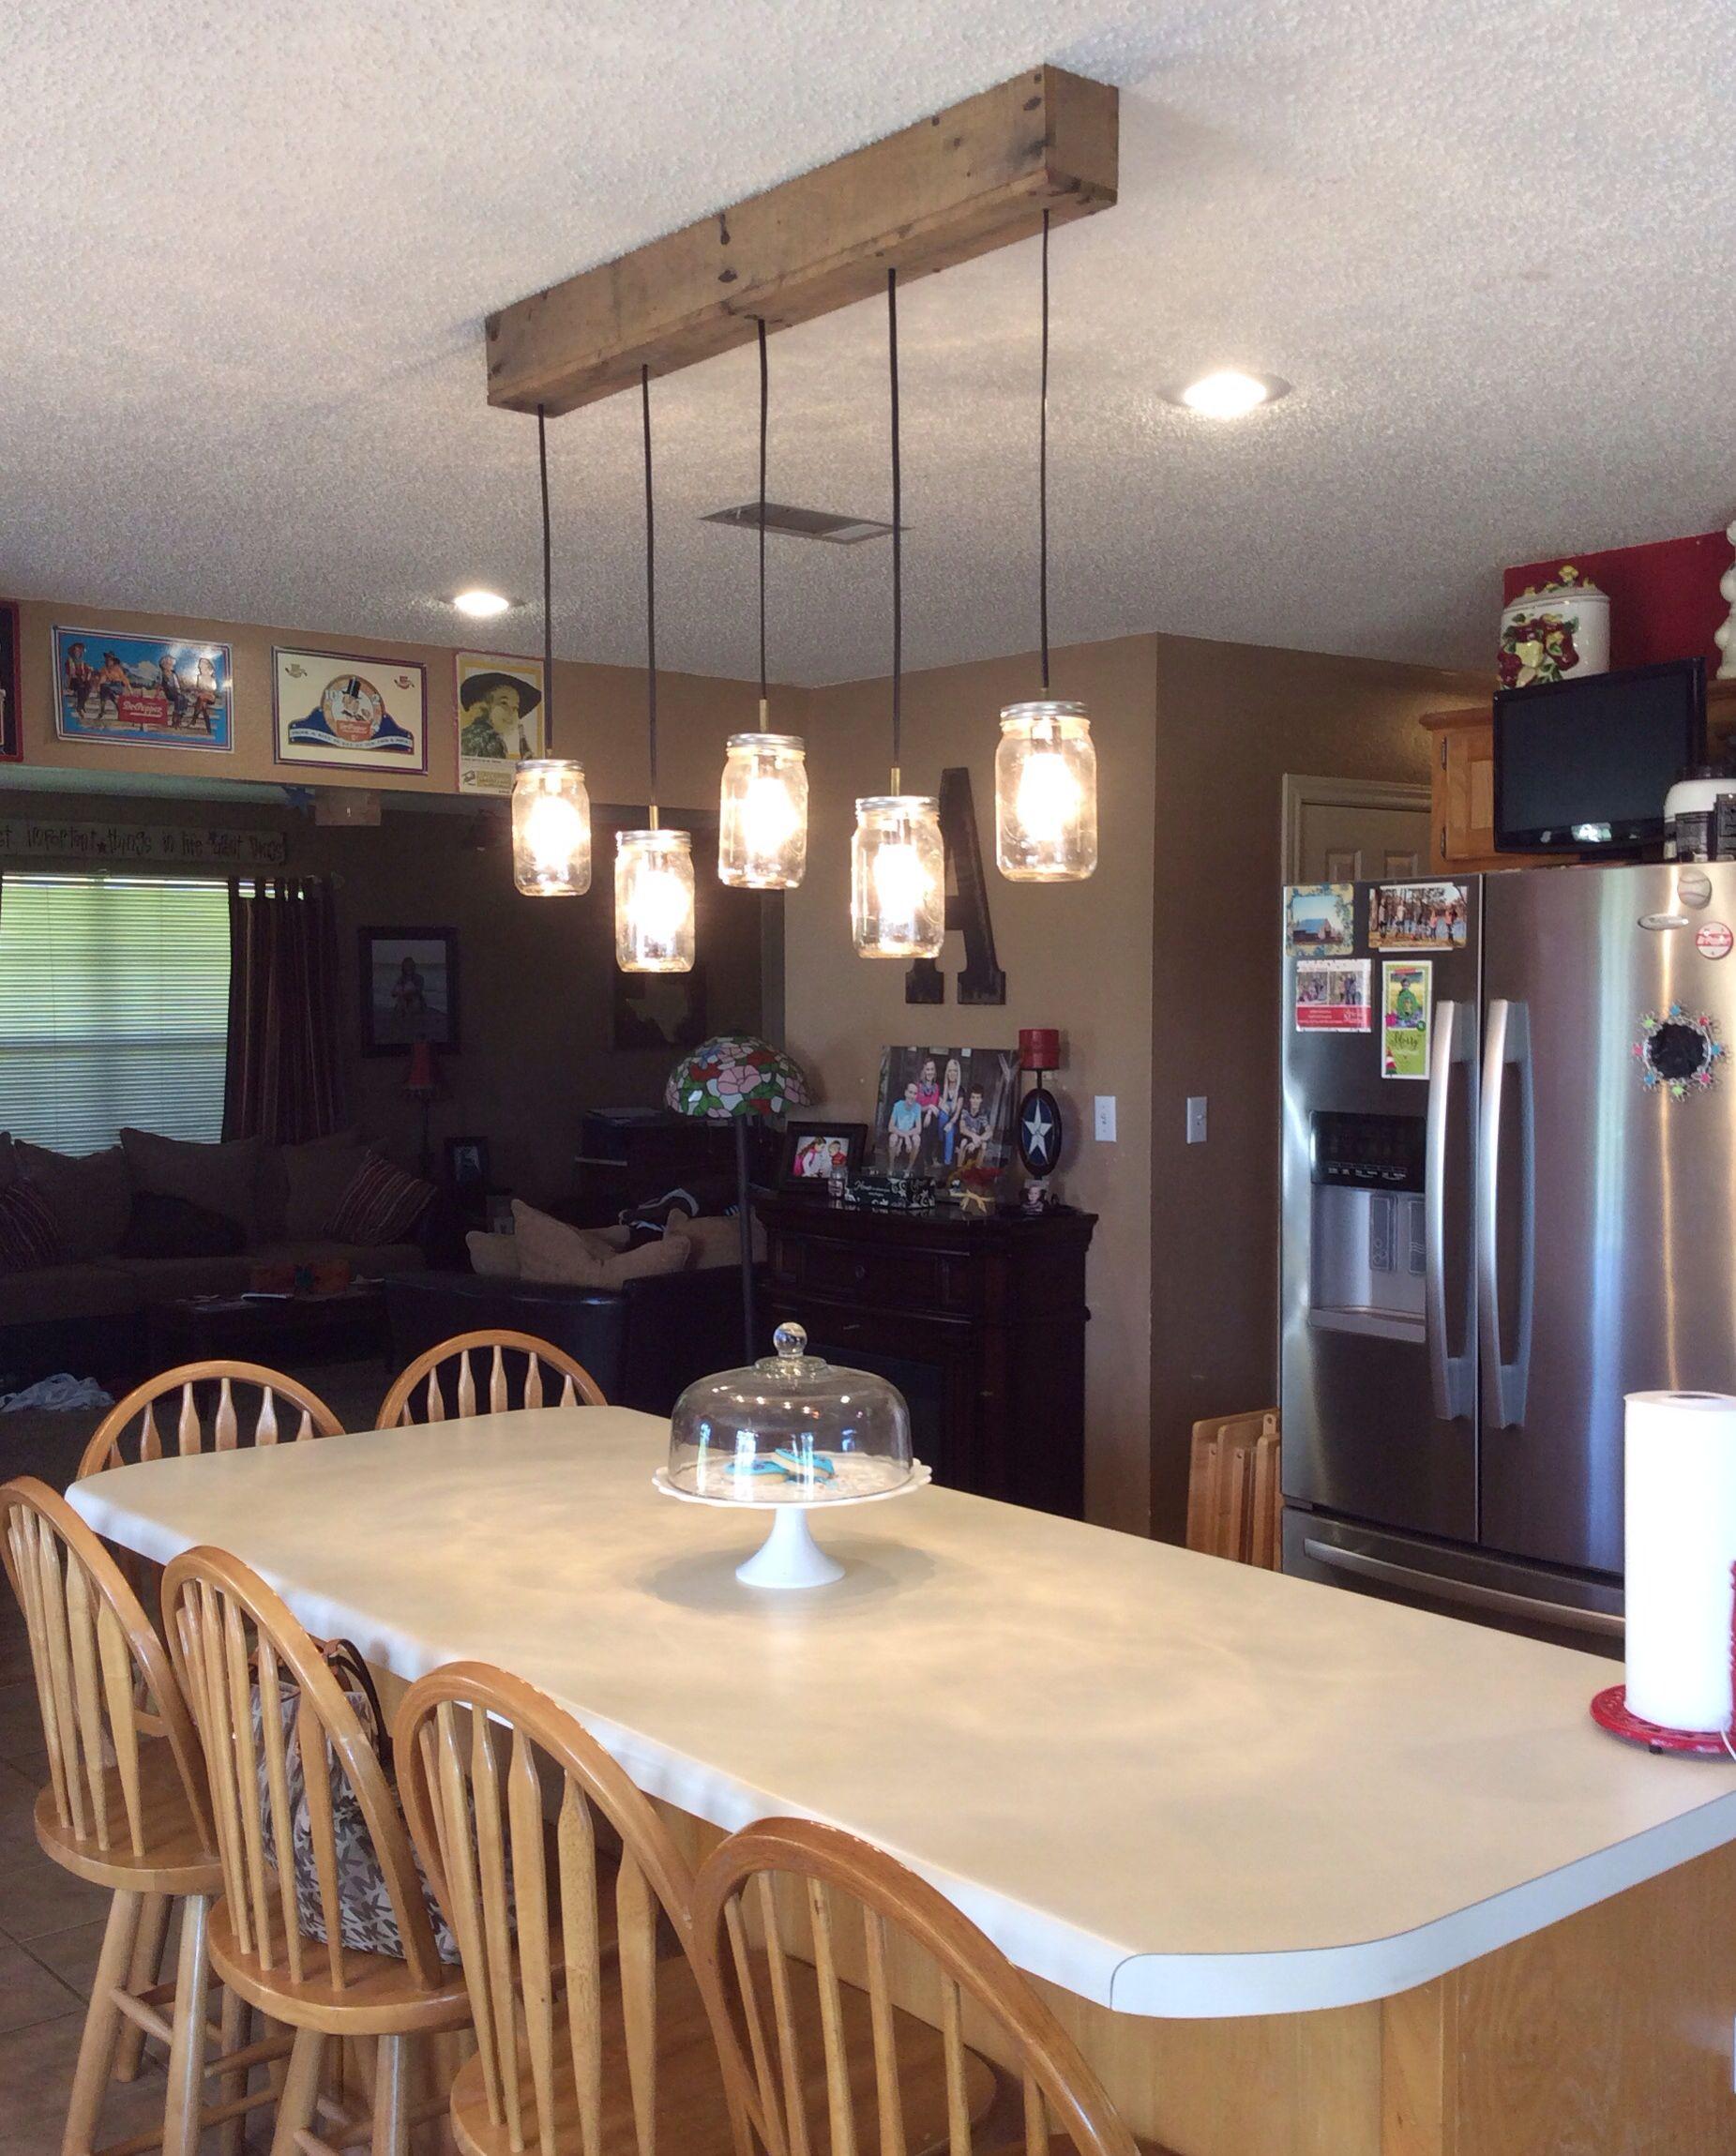 My DIY kitchen mason jar light ( hubby made)  hanging over my bar.